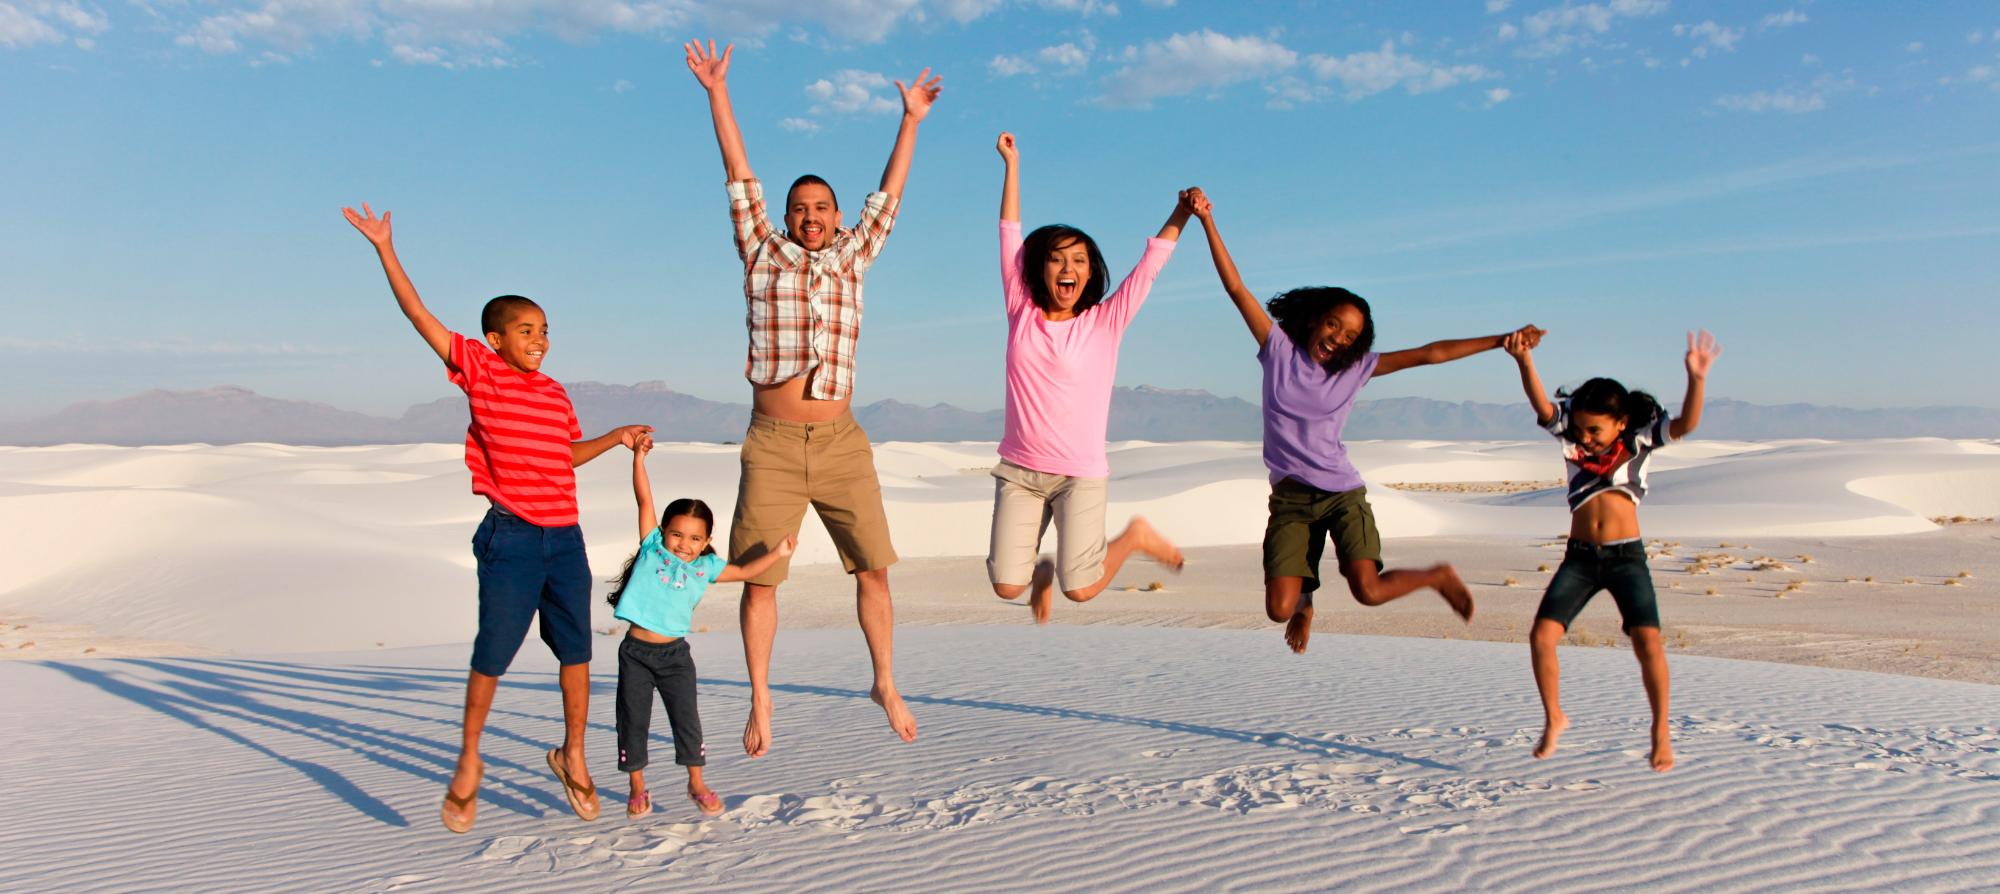 8 Ways To Spring Break In New Mexico In Las Cruces School District 2020 Spring Break